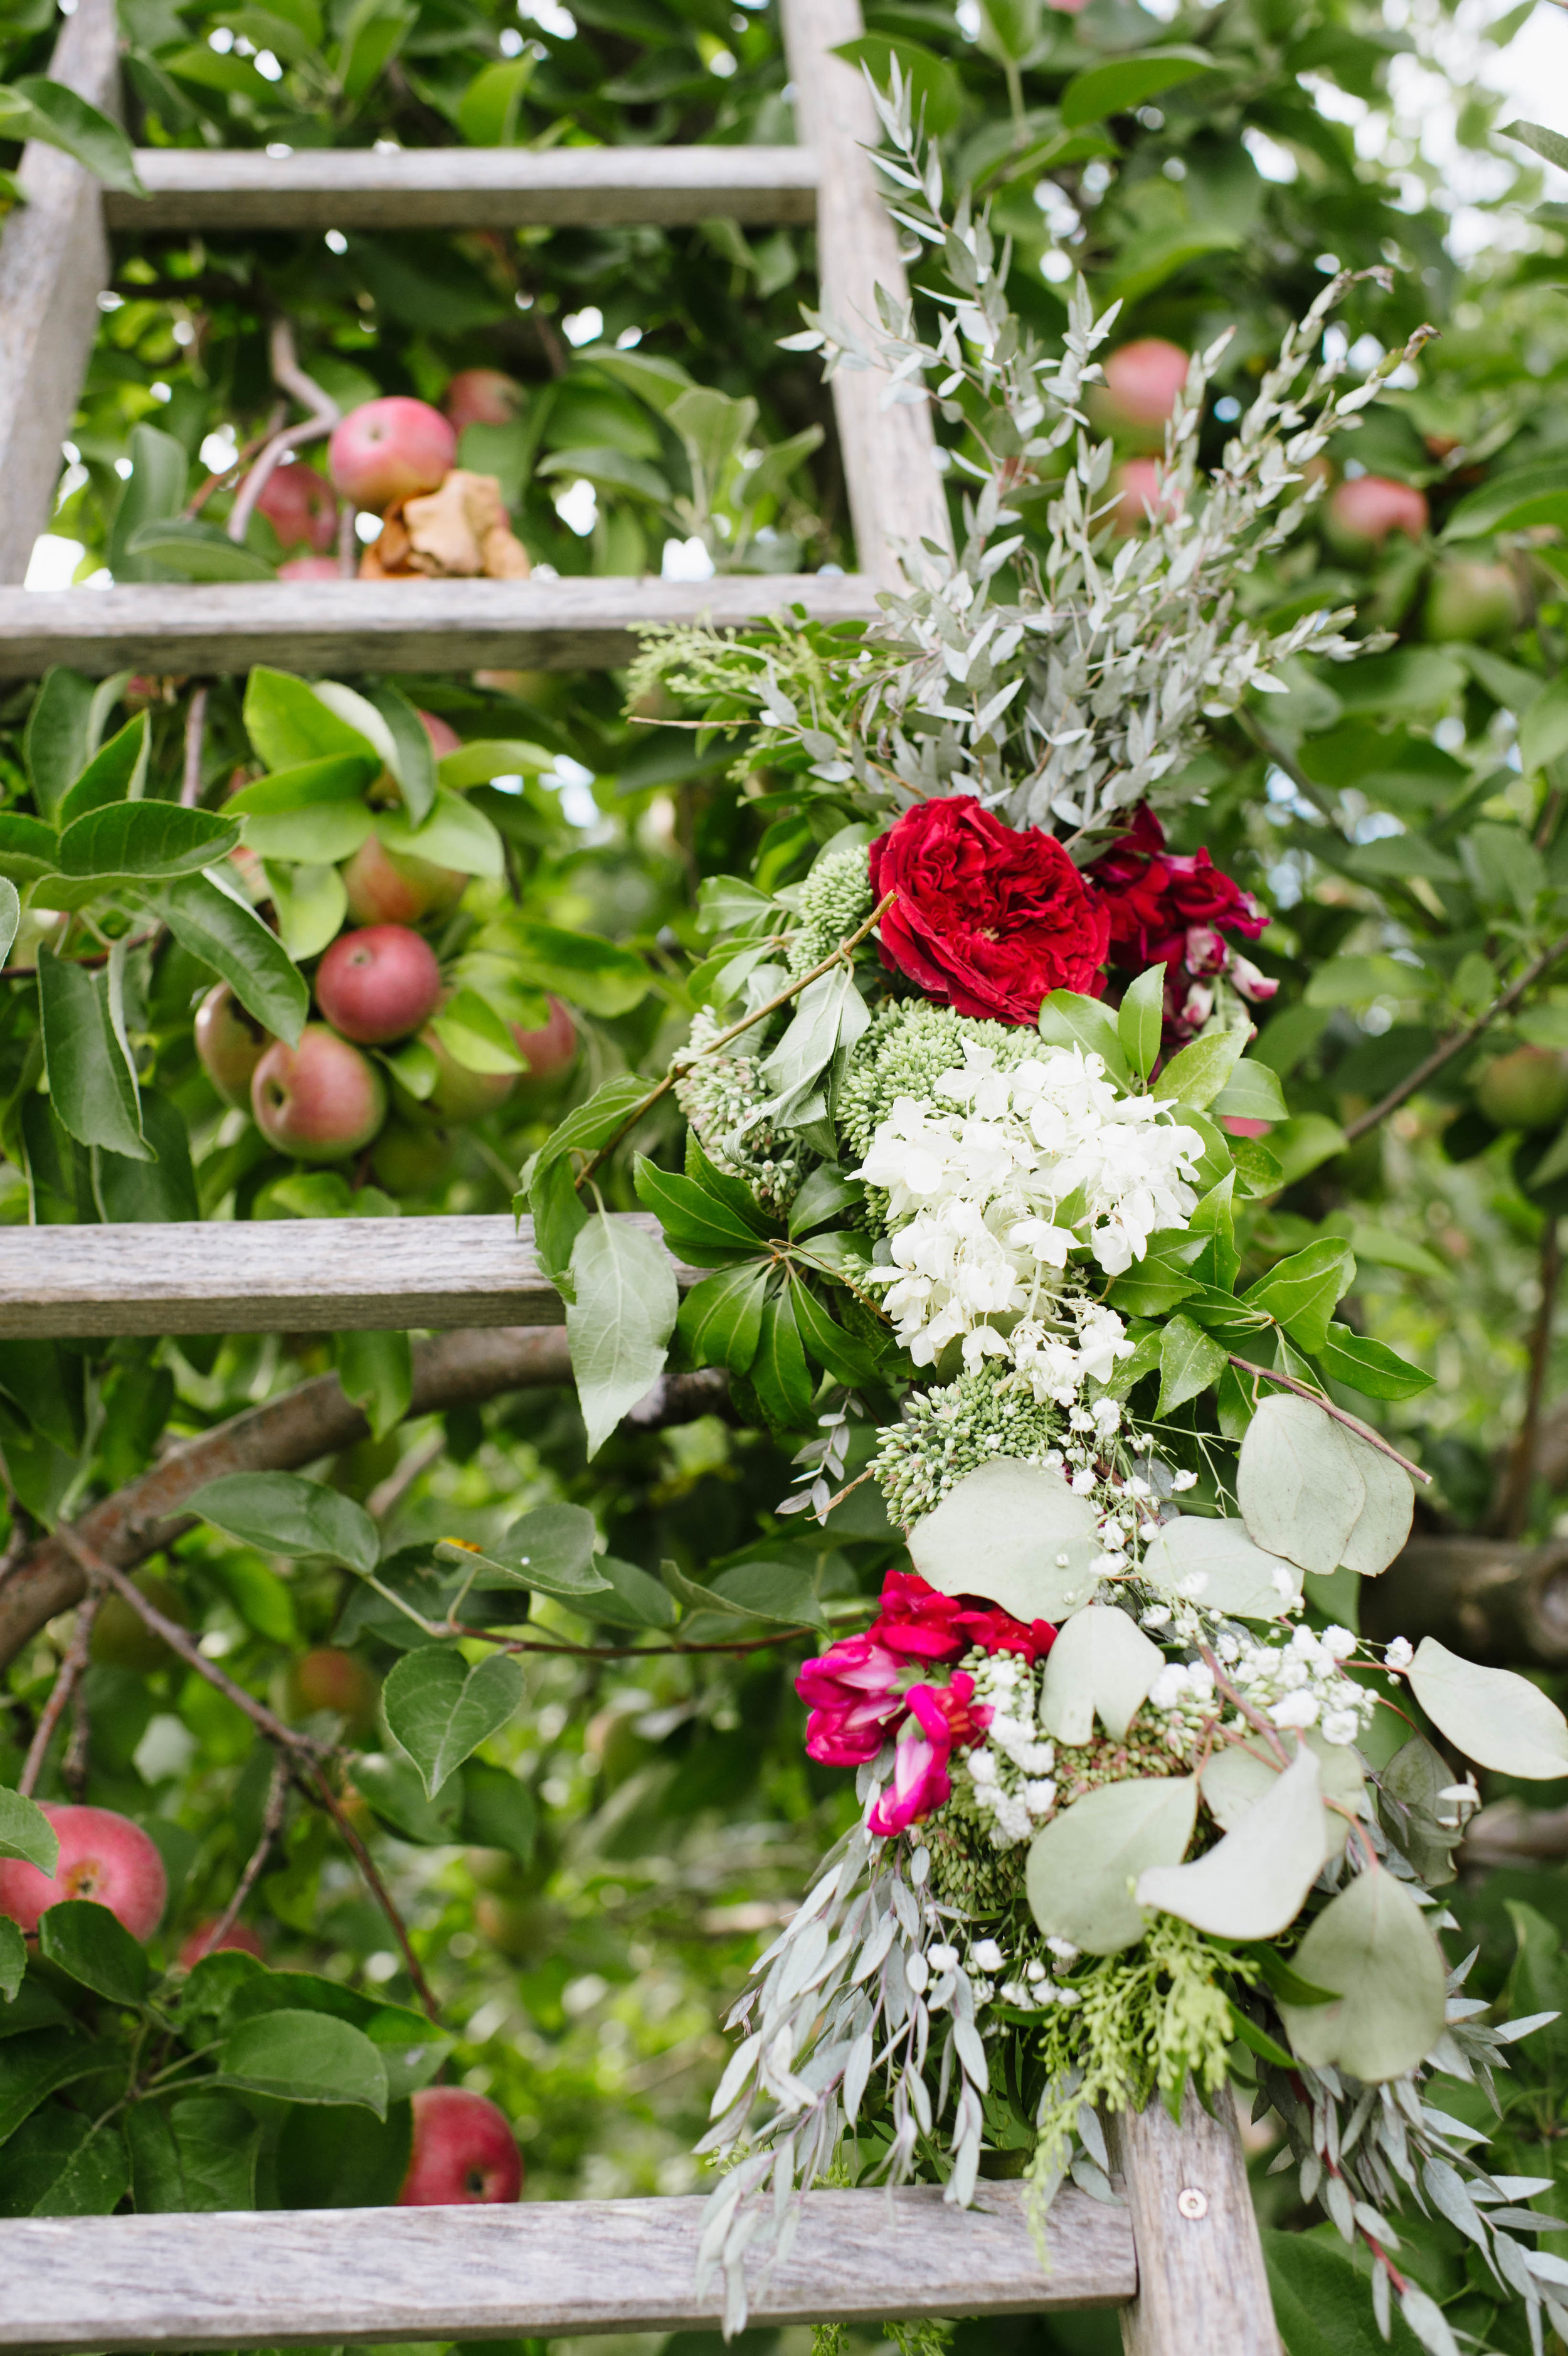 Candid-Wedding-Photography-Boston010.jpg